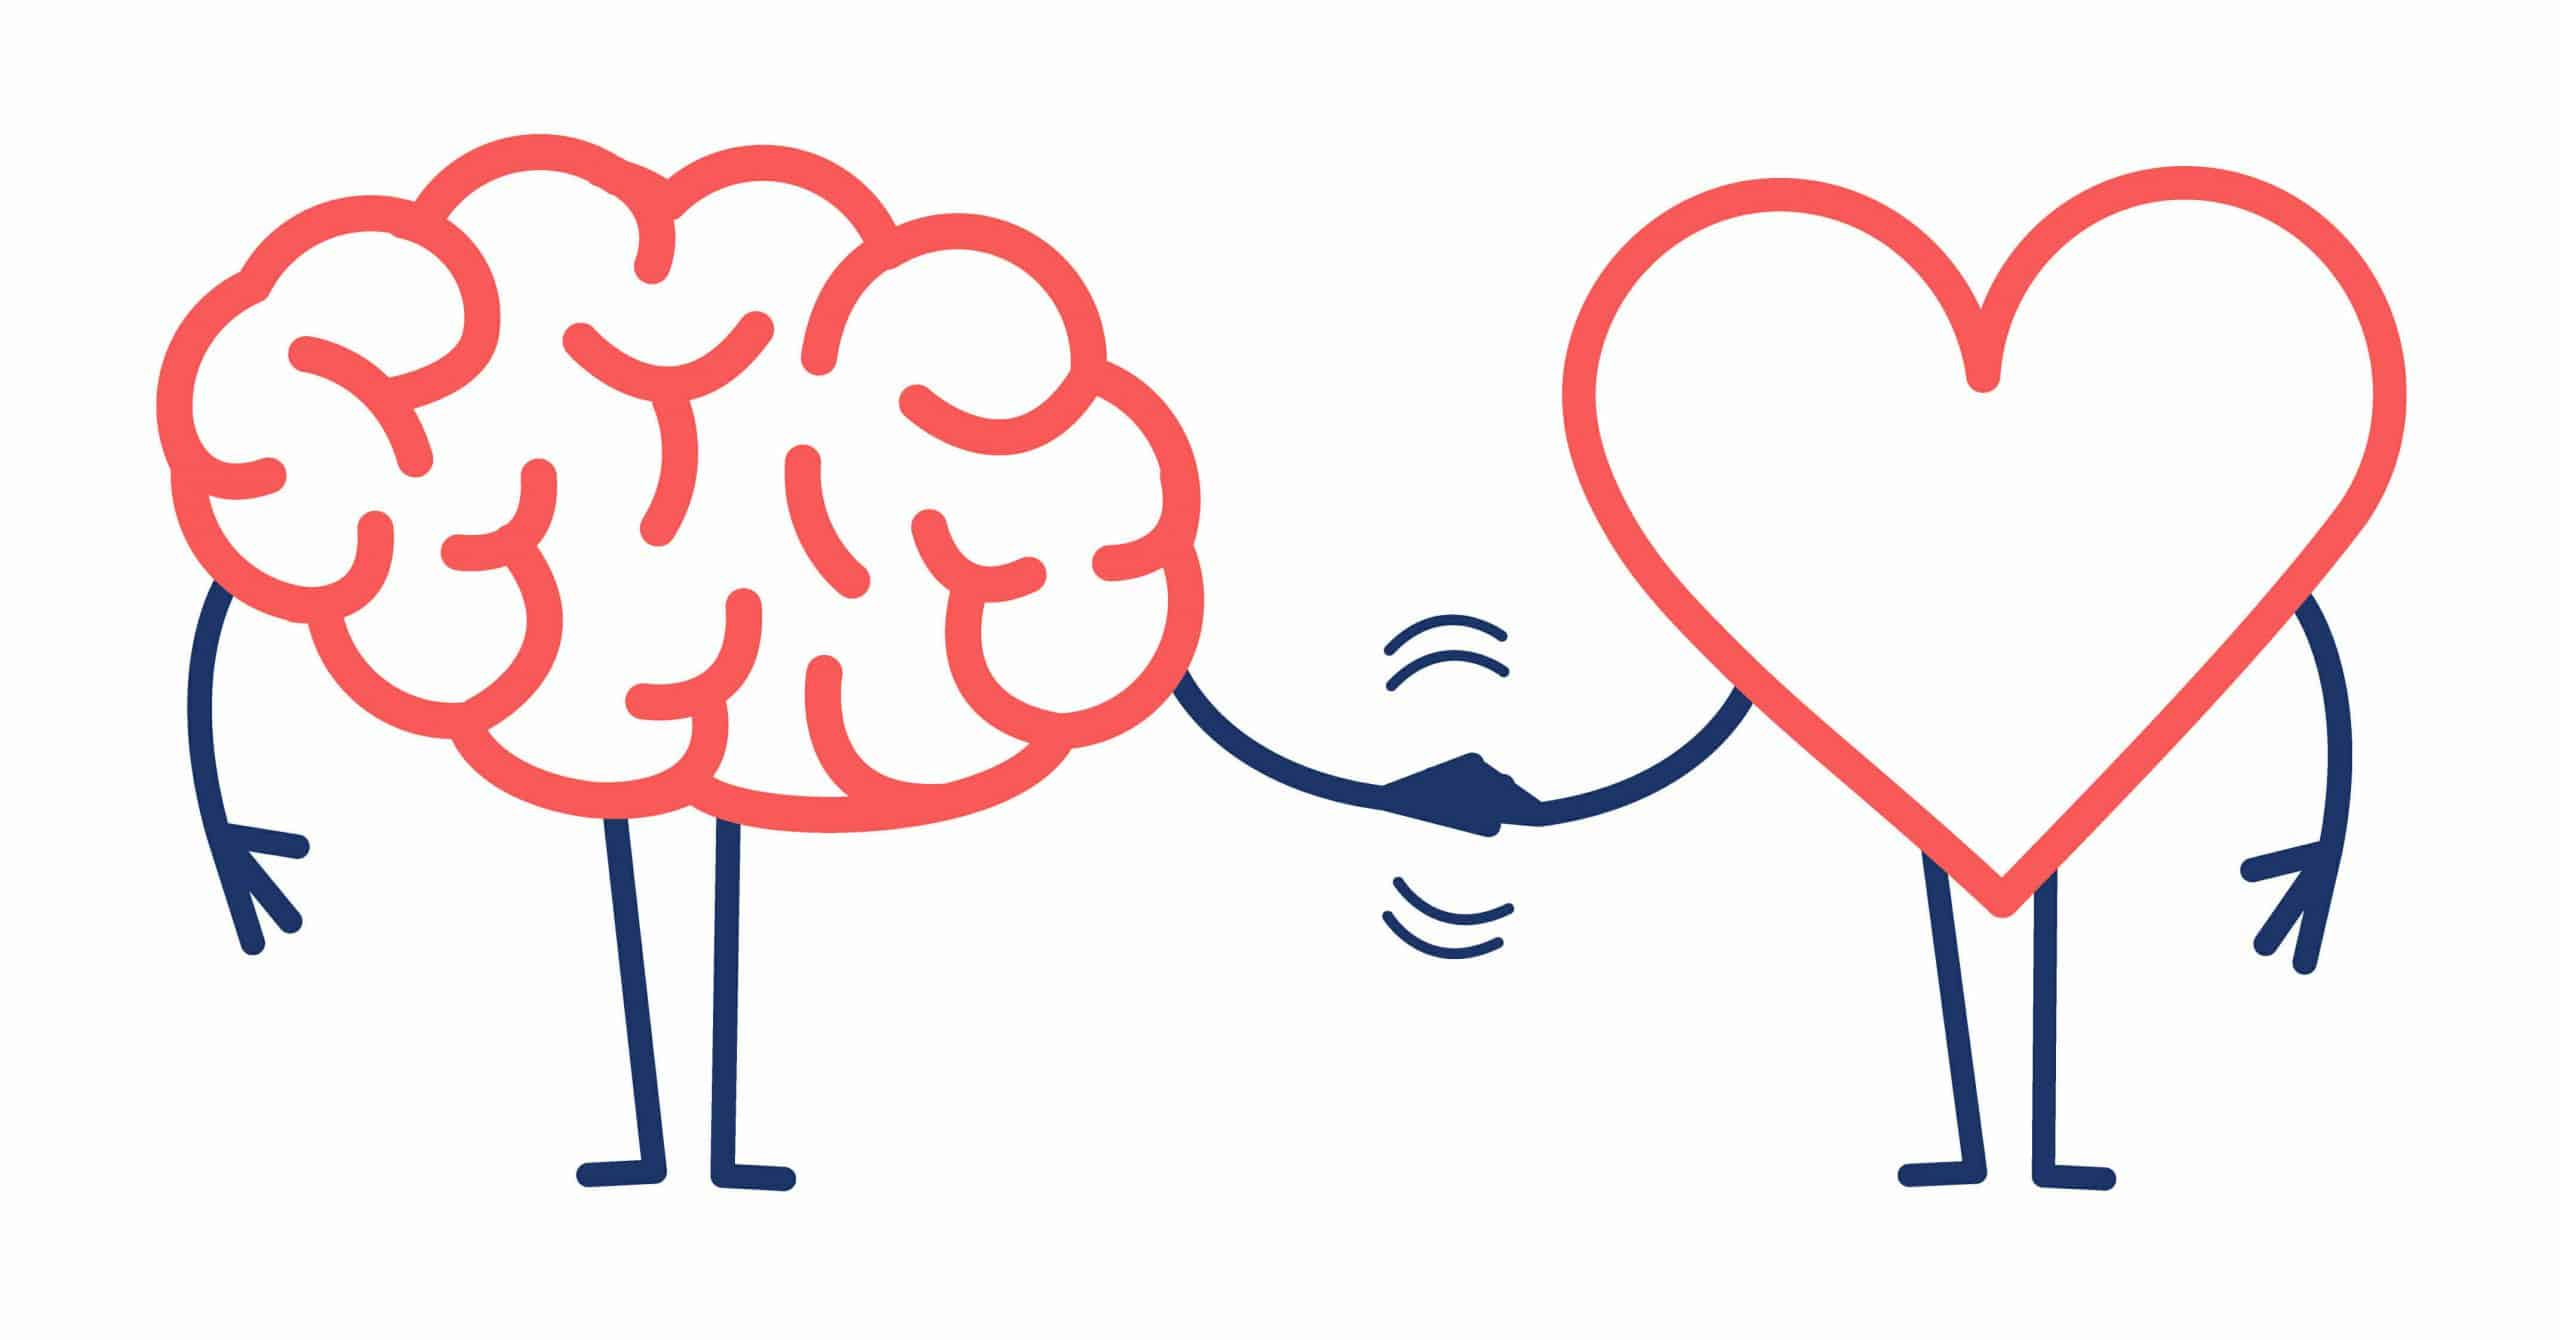 Empathy Communication สื่ออย่างไรให้สารเข้าถึงใจคนฟัง